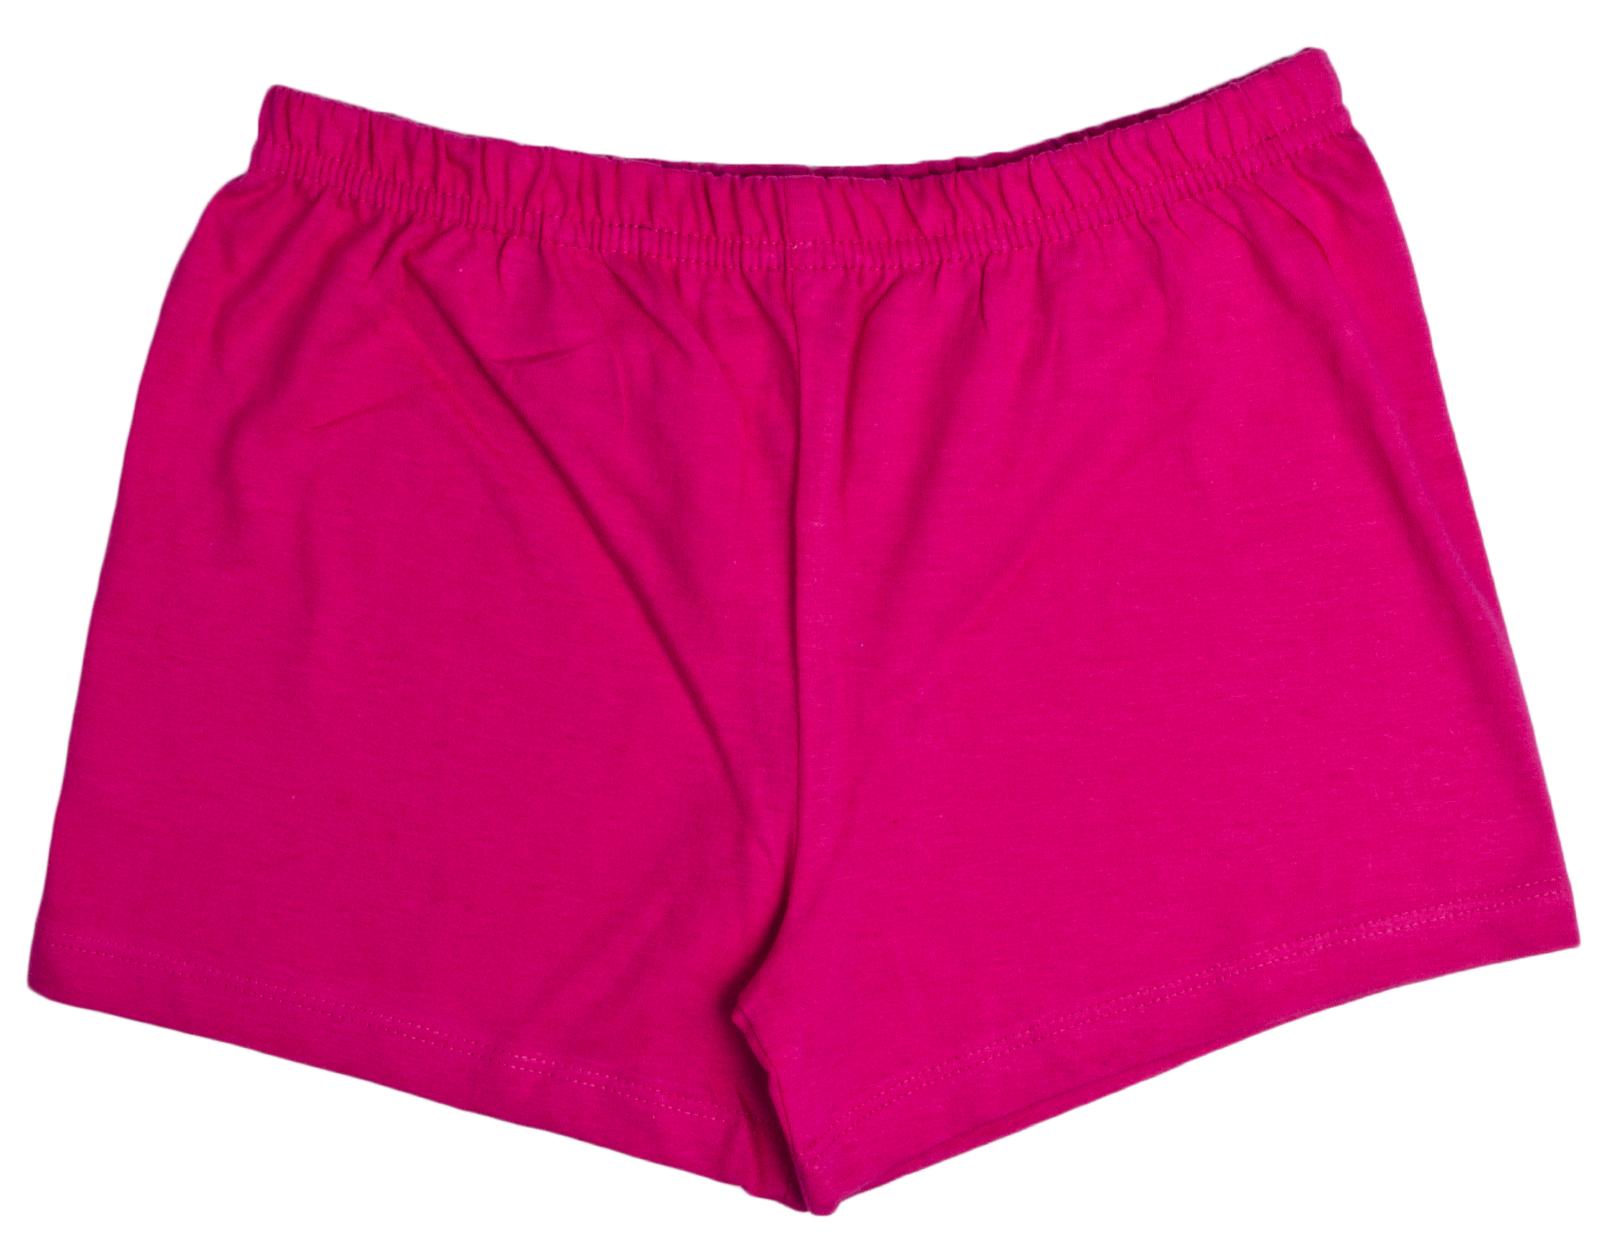 Dc super hero girls short pyjamas short sleeved t shirt T shirt and shorts pyjamas